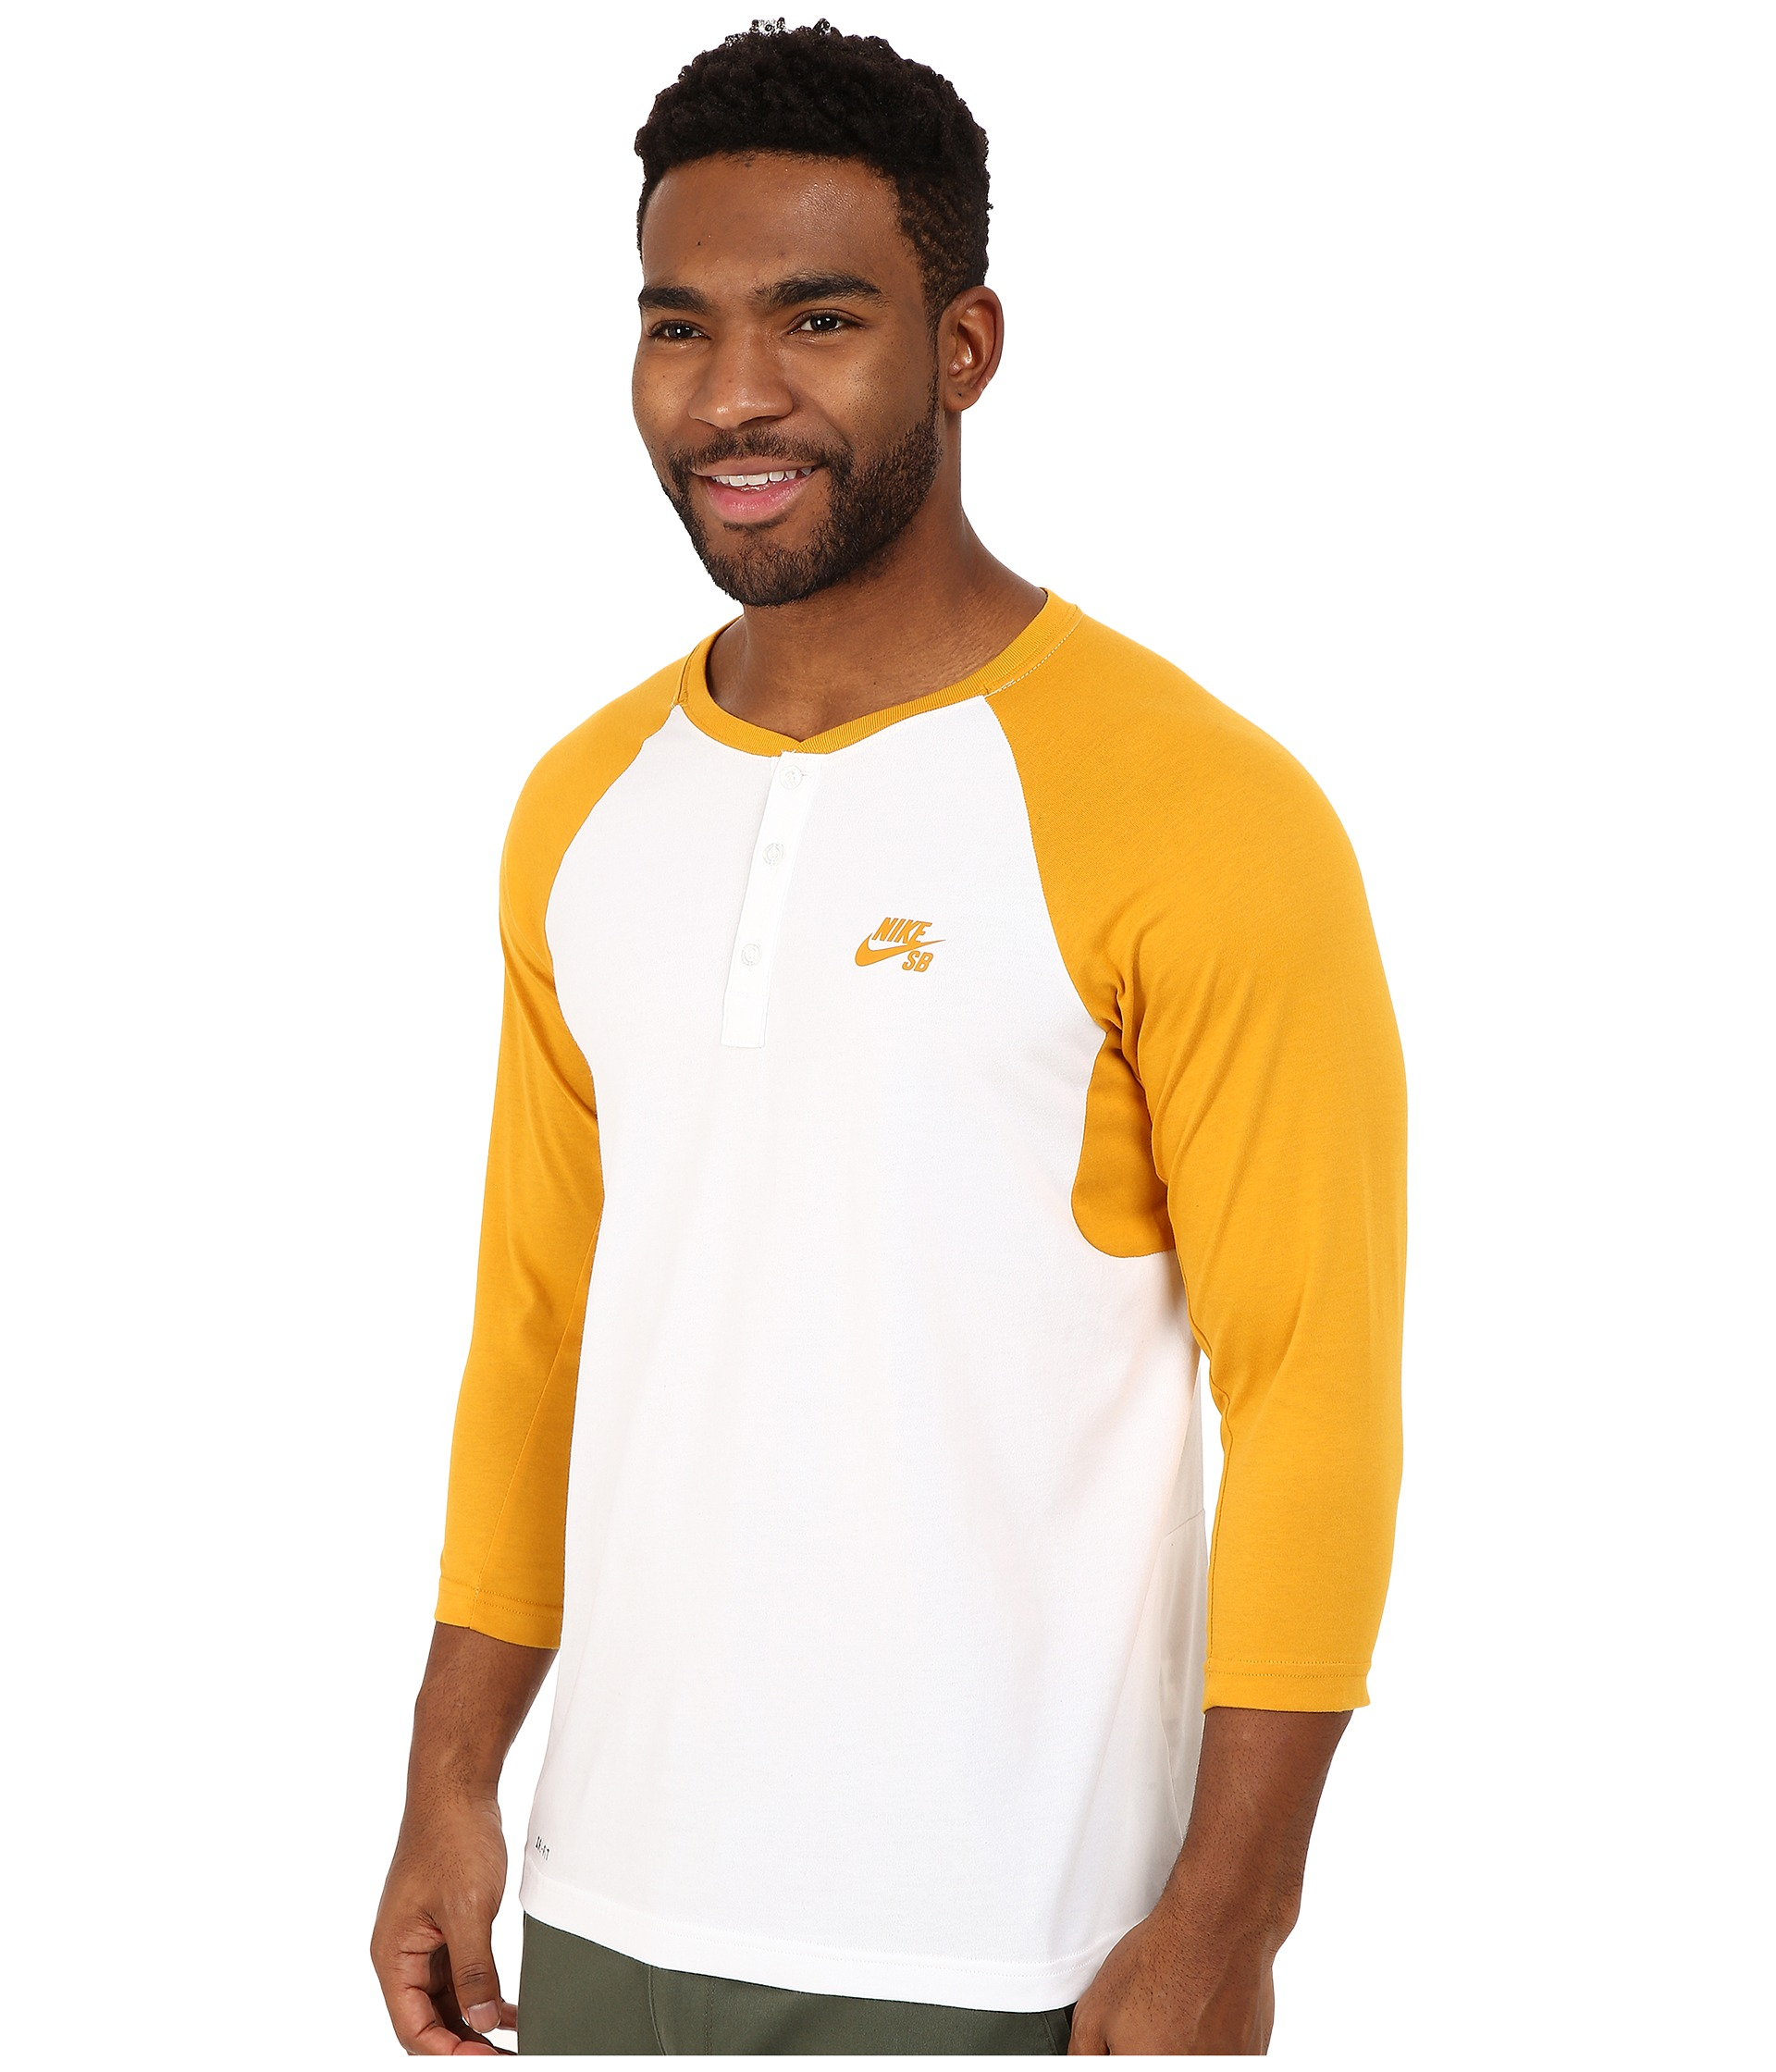 4a8decbc Nike Sb Dri-fit 3/4 Sleeve Henley Top in Metallic for Men - Lyst